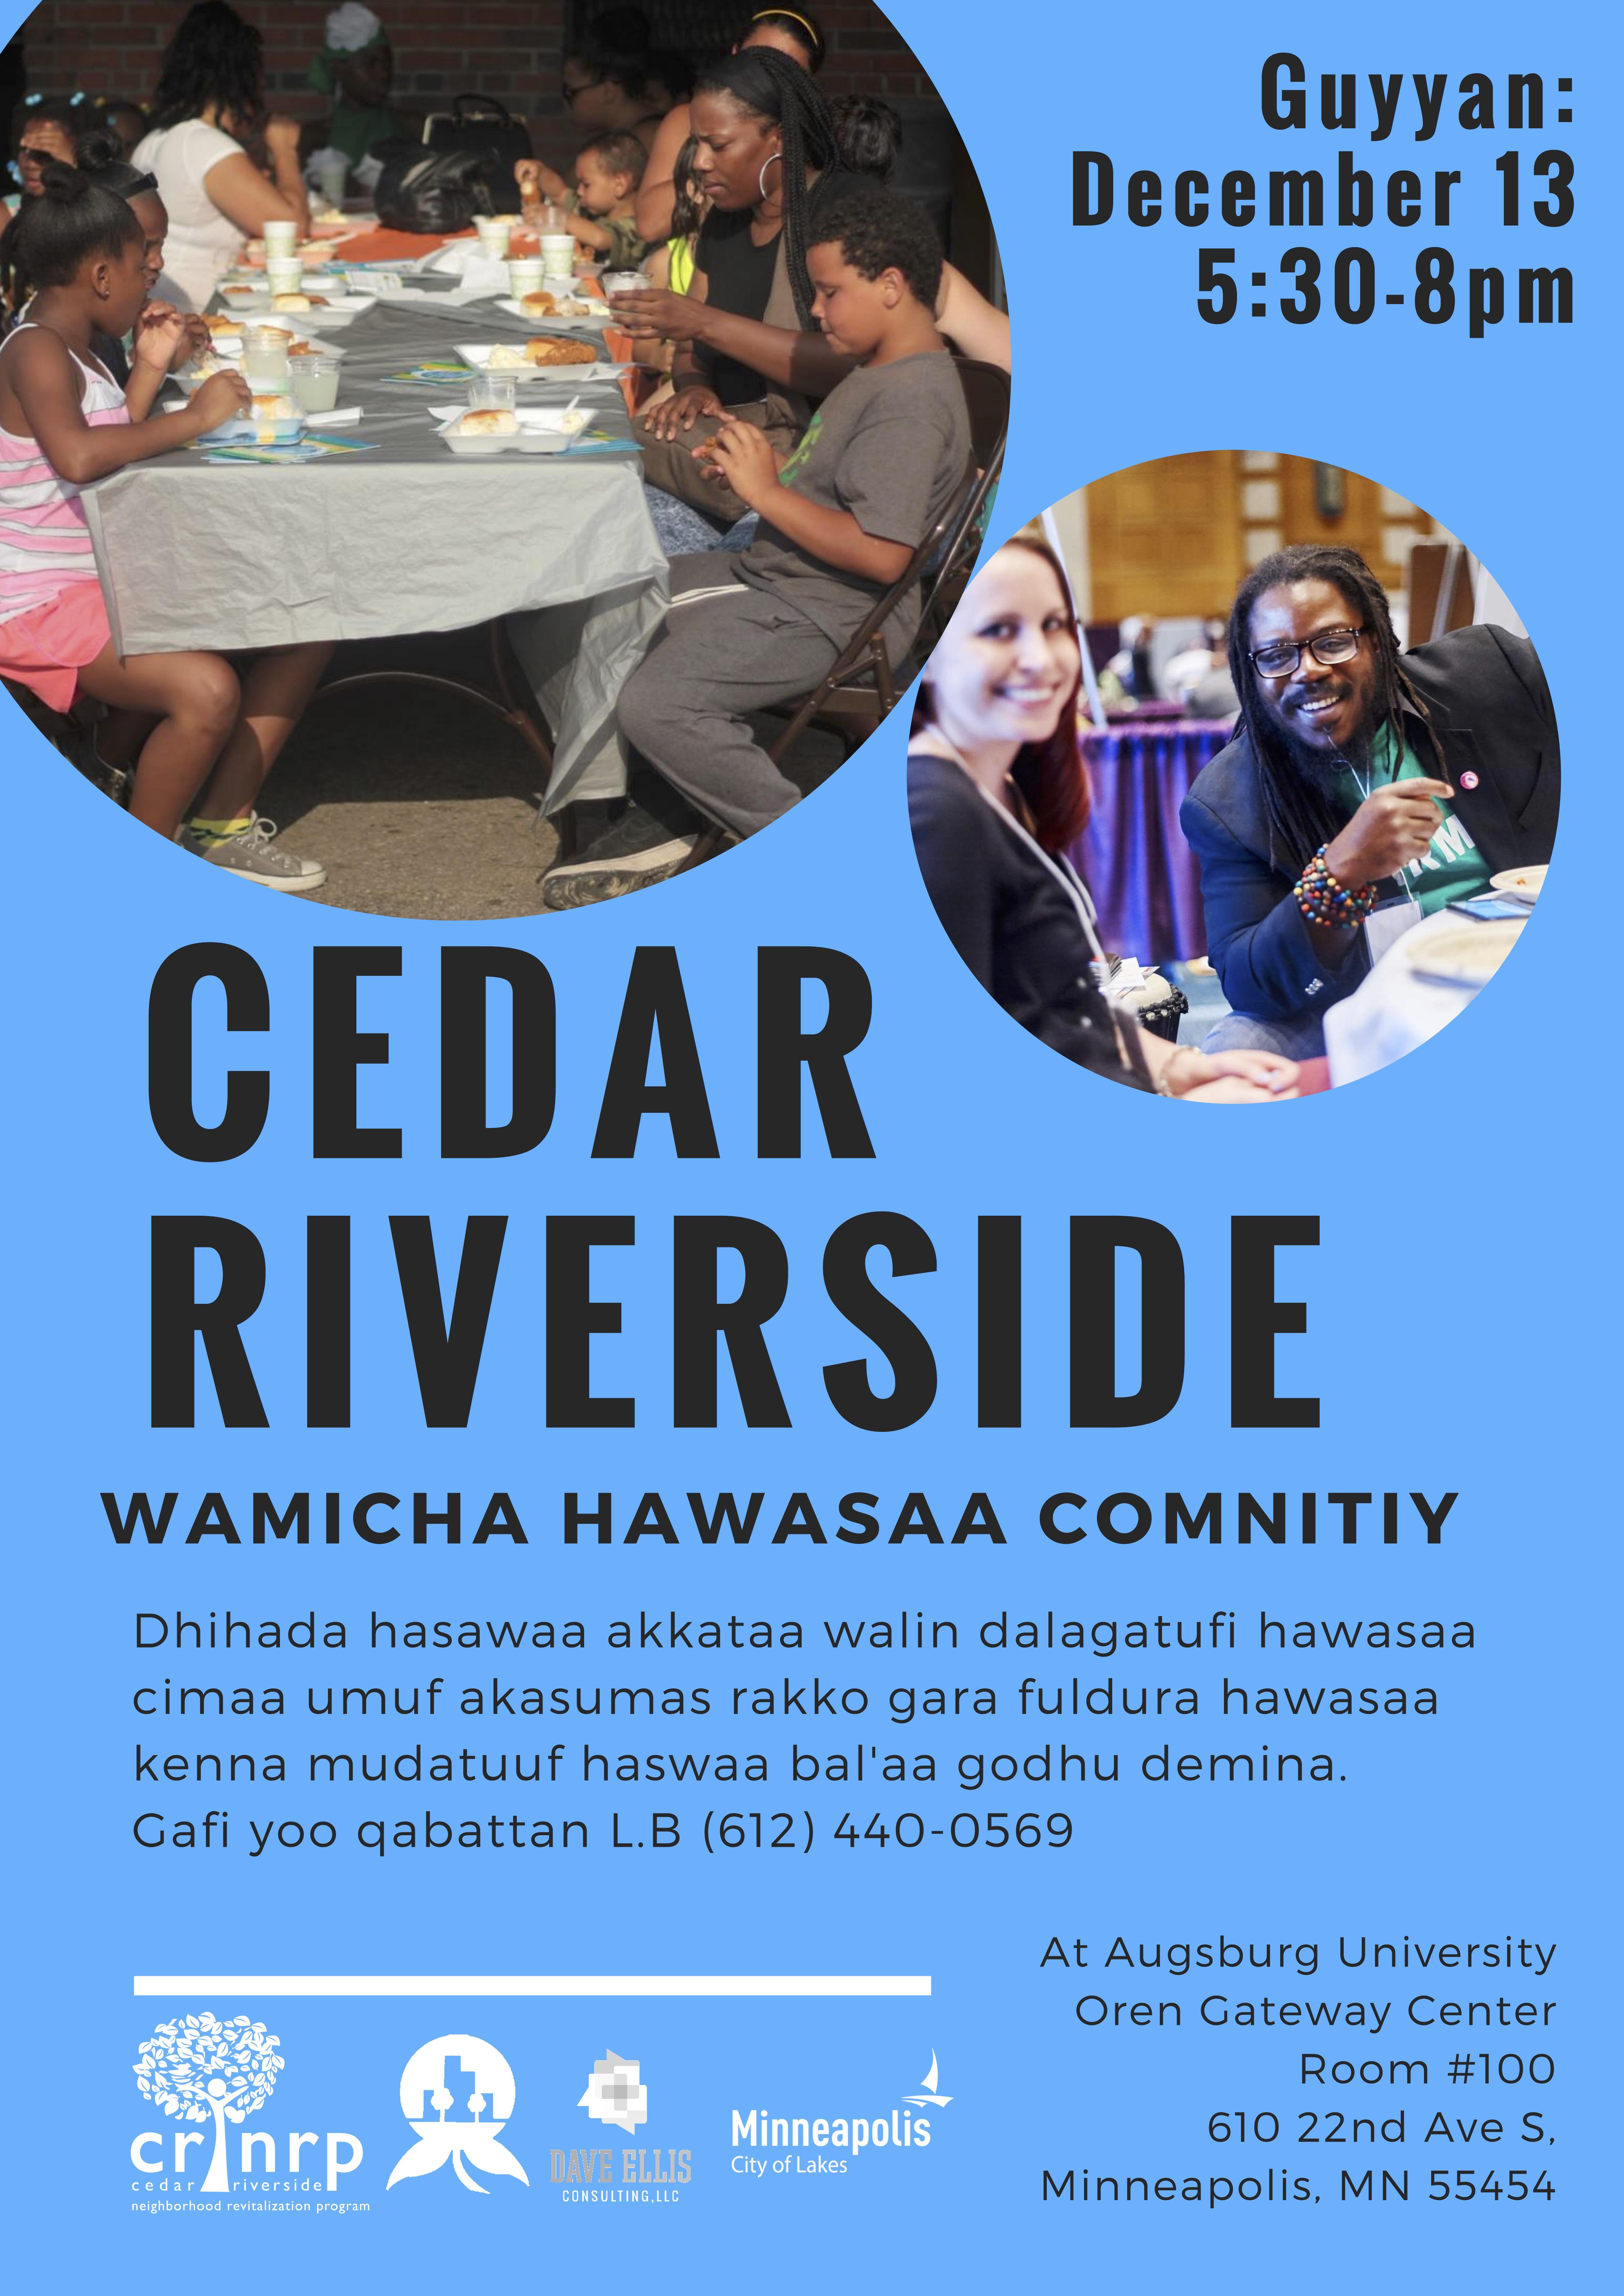 1213_Oromo_Cedar_Riverside_Community_Gathering.jpg